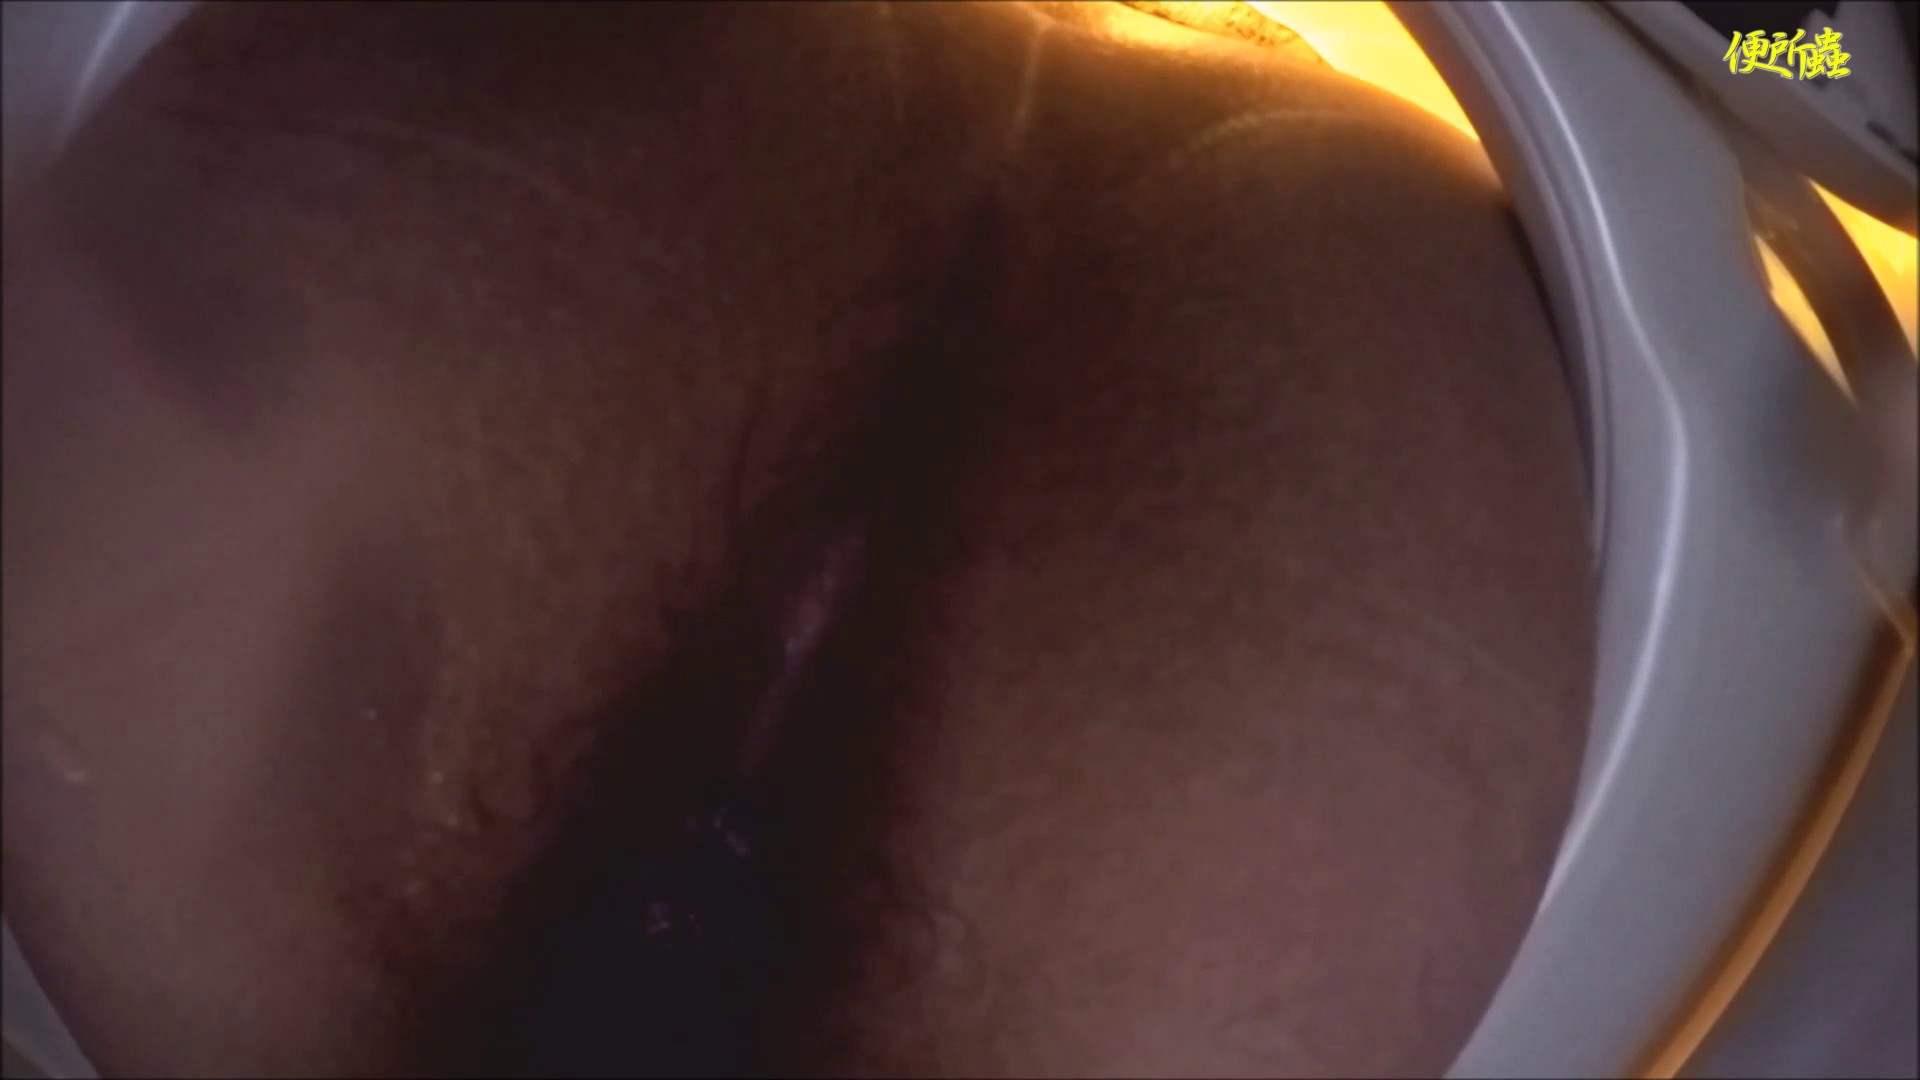 vol.07 便所蟲さんのリターン~寺子屋洗面所盗撮~※画質改善※総勢7名 洗面所 オマンコ無修正動画無料 64枚